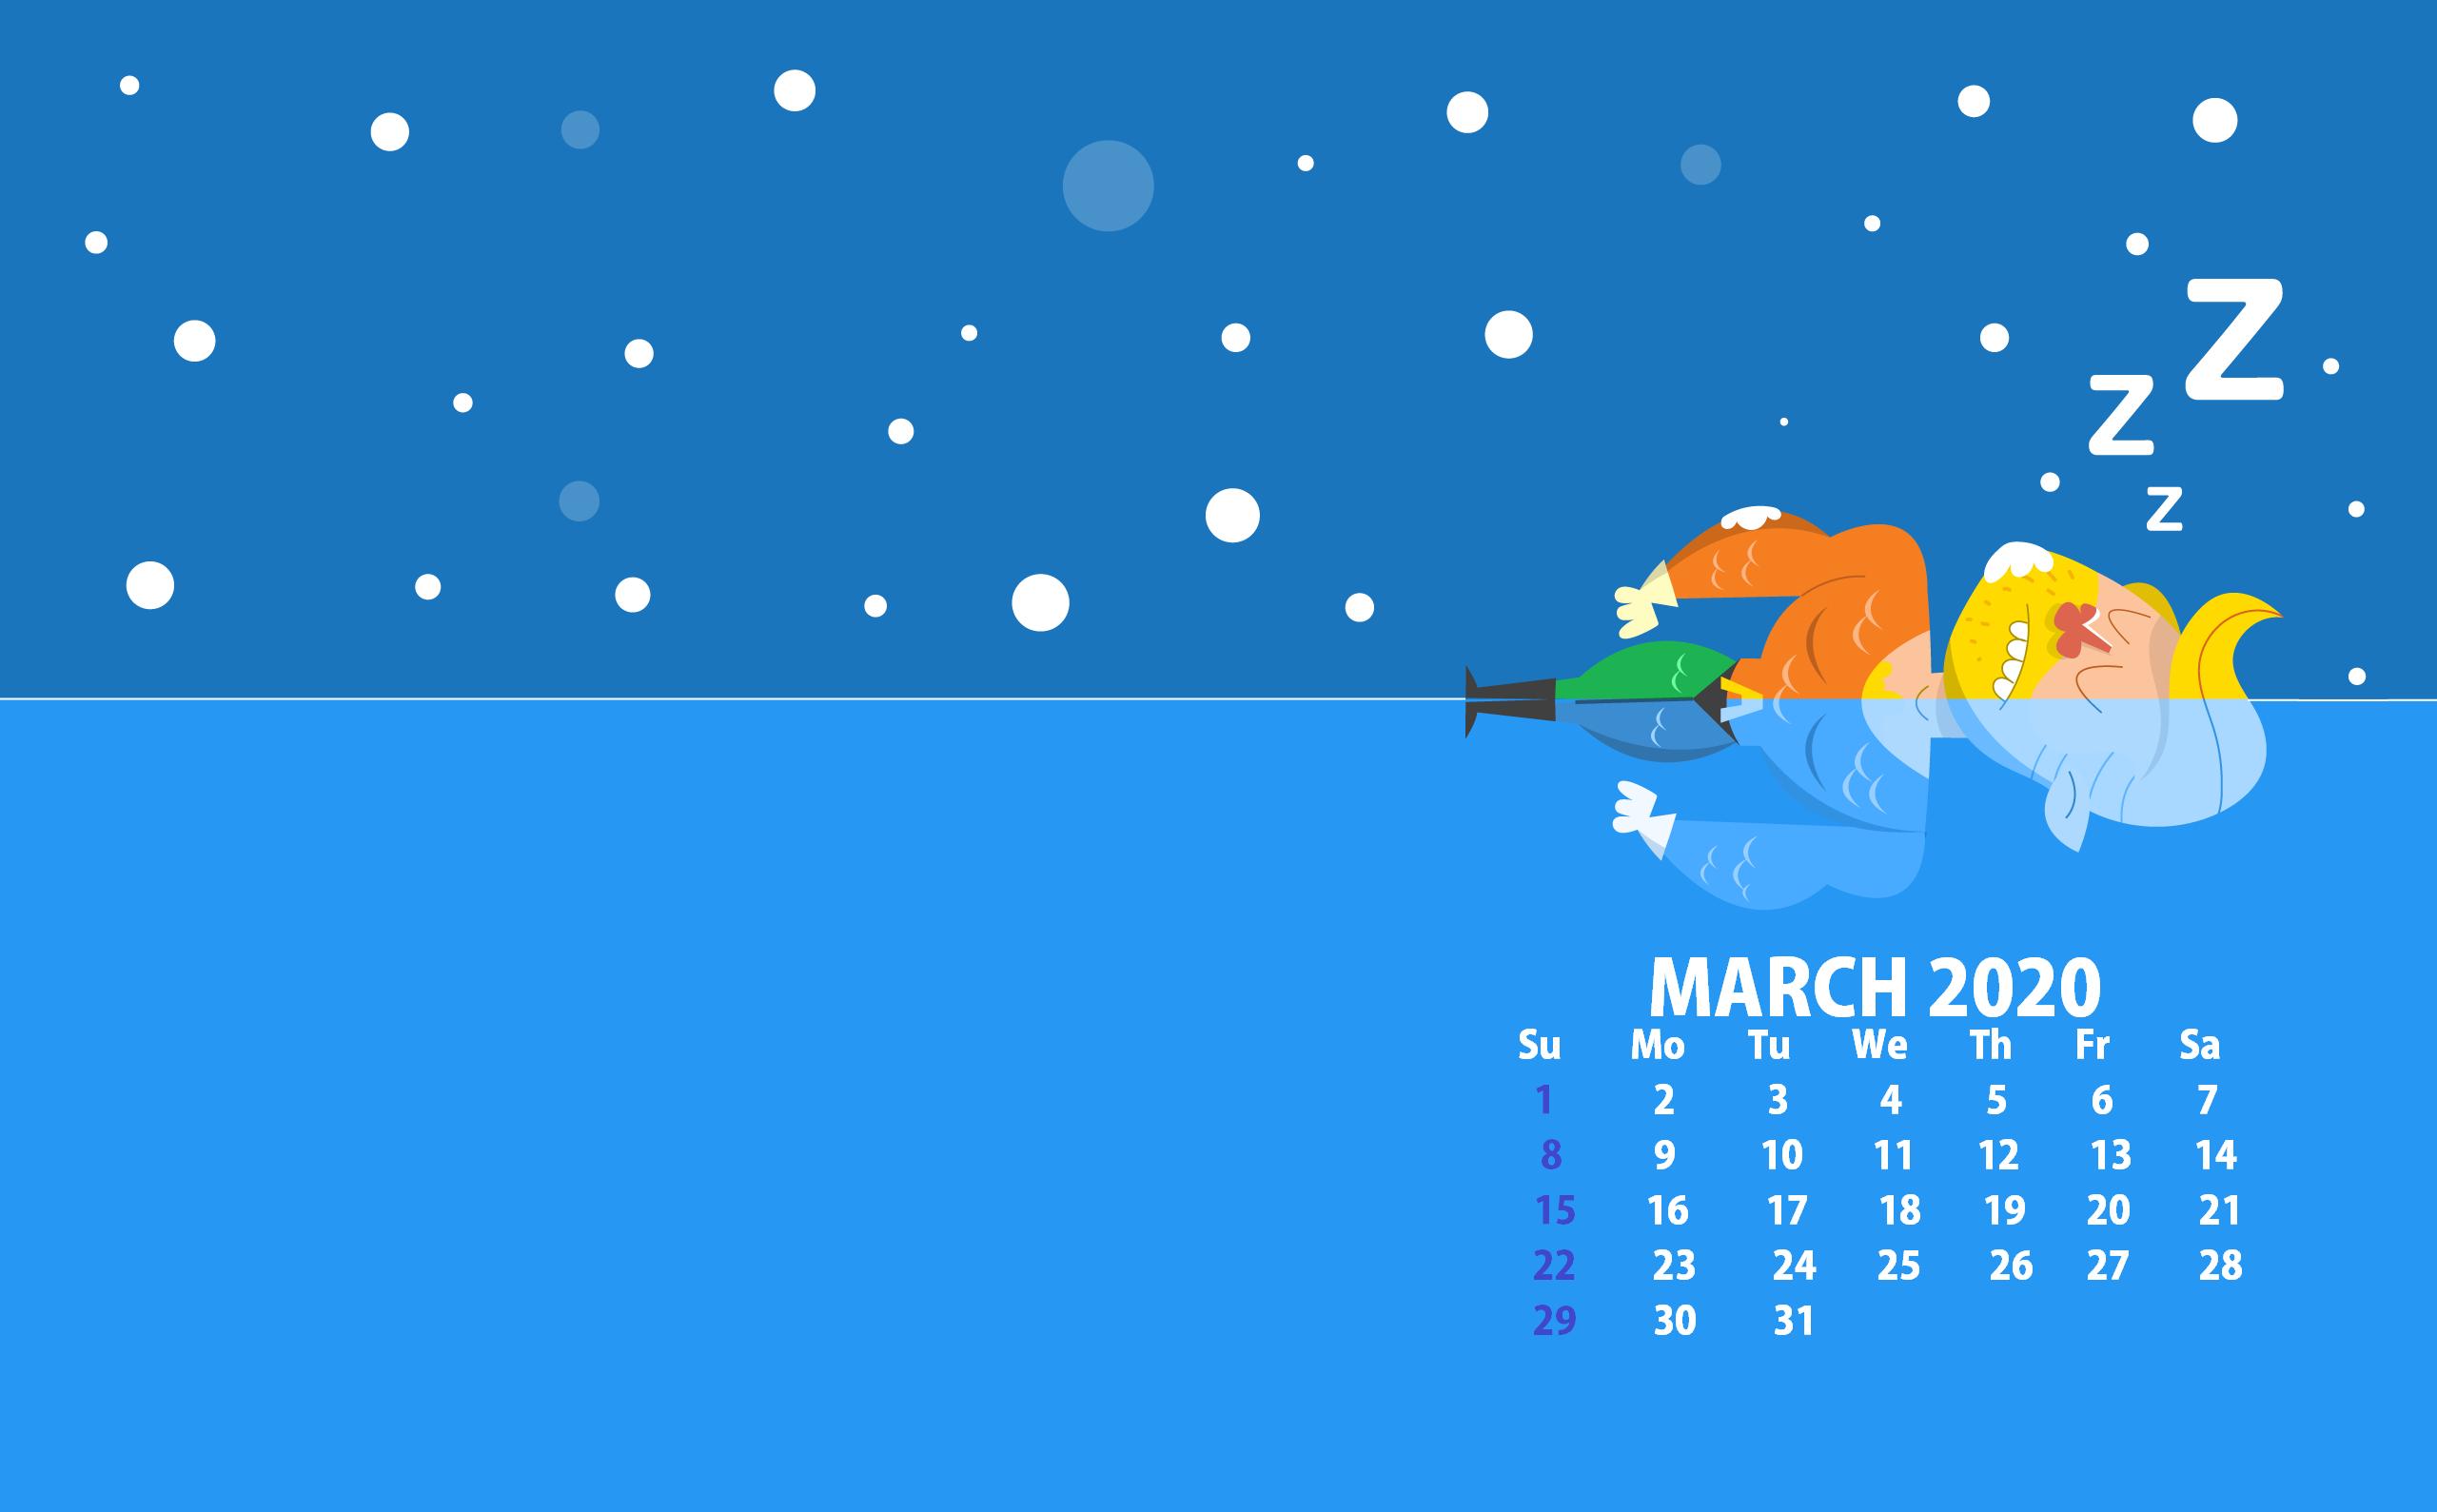 March 2020 Desktop Screensaver